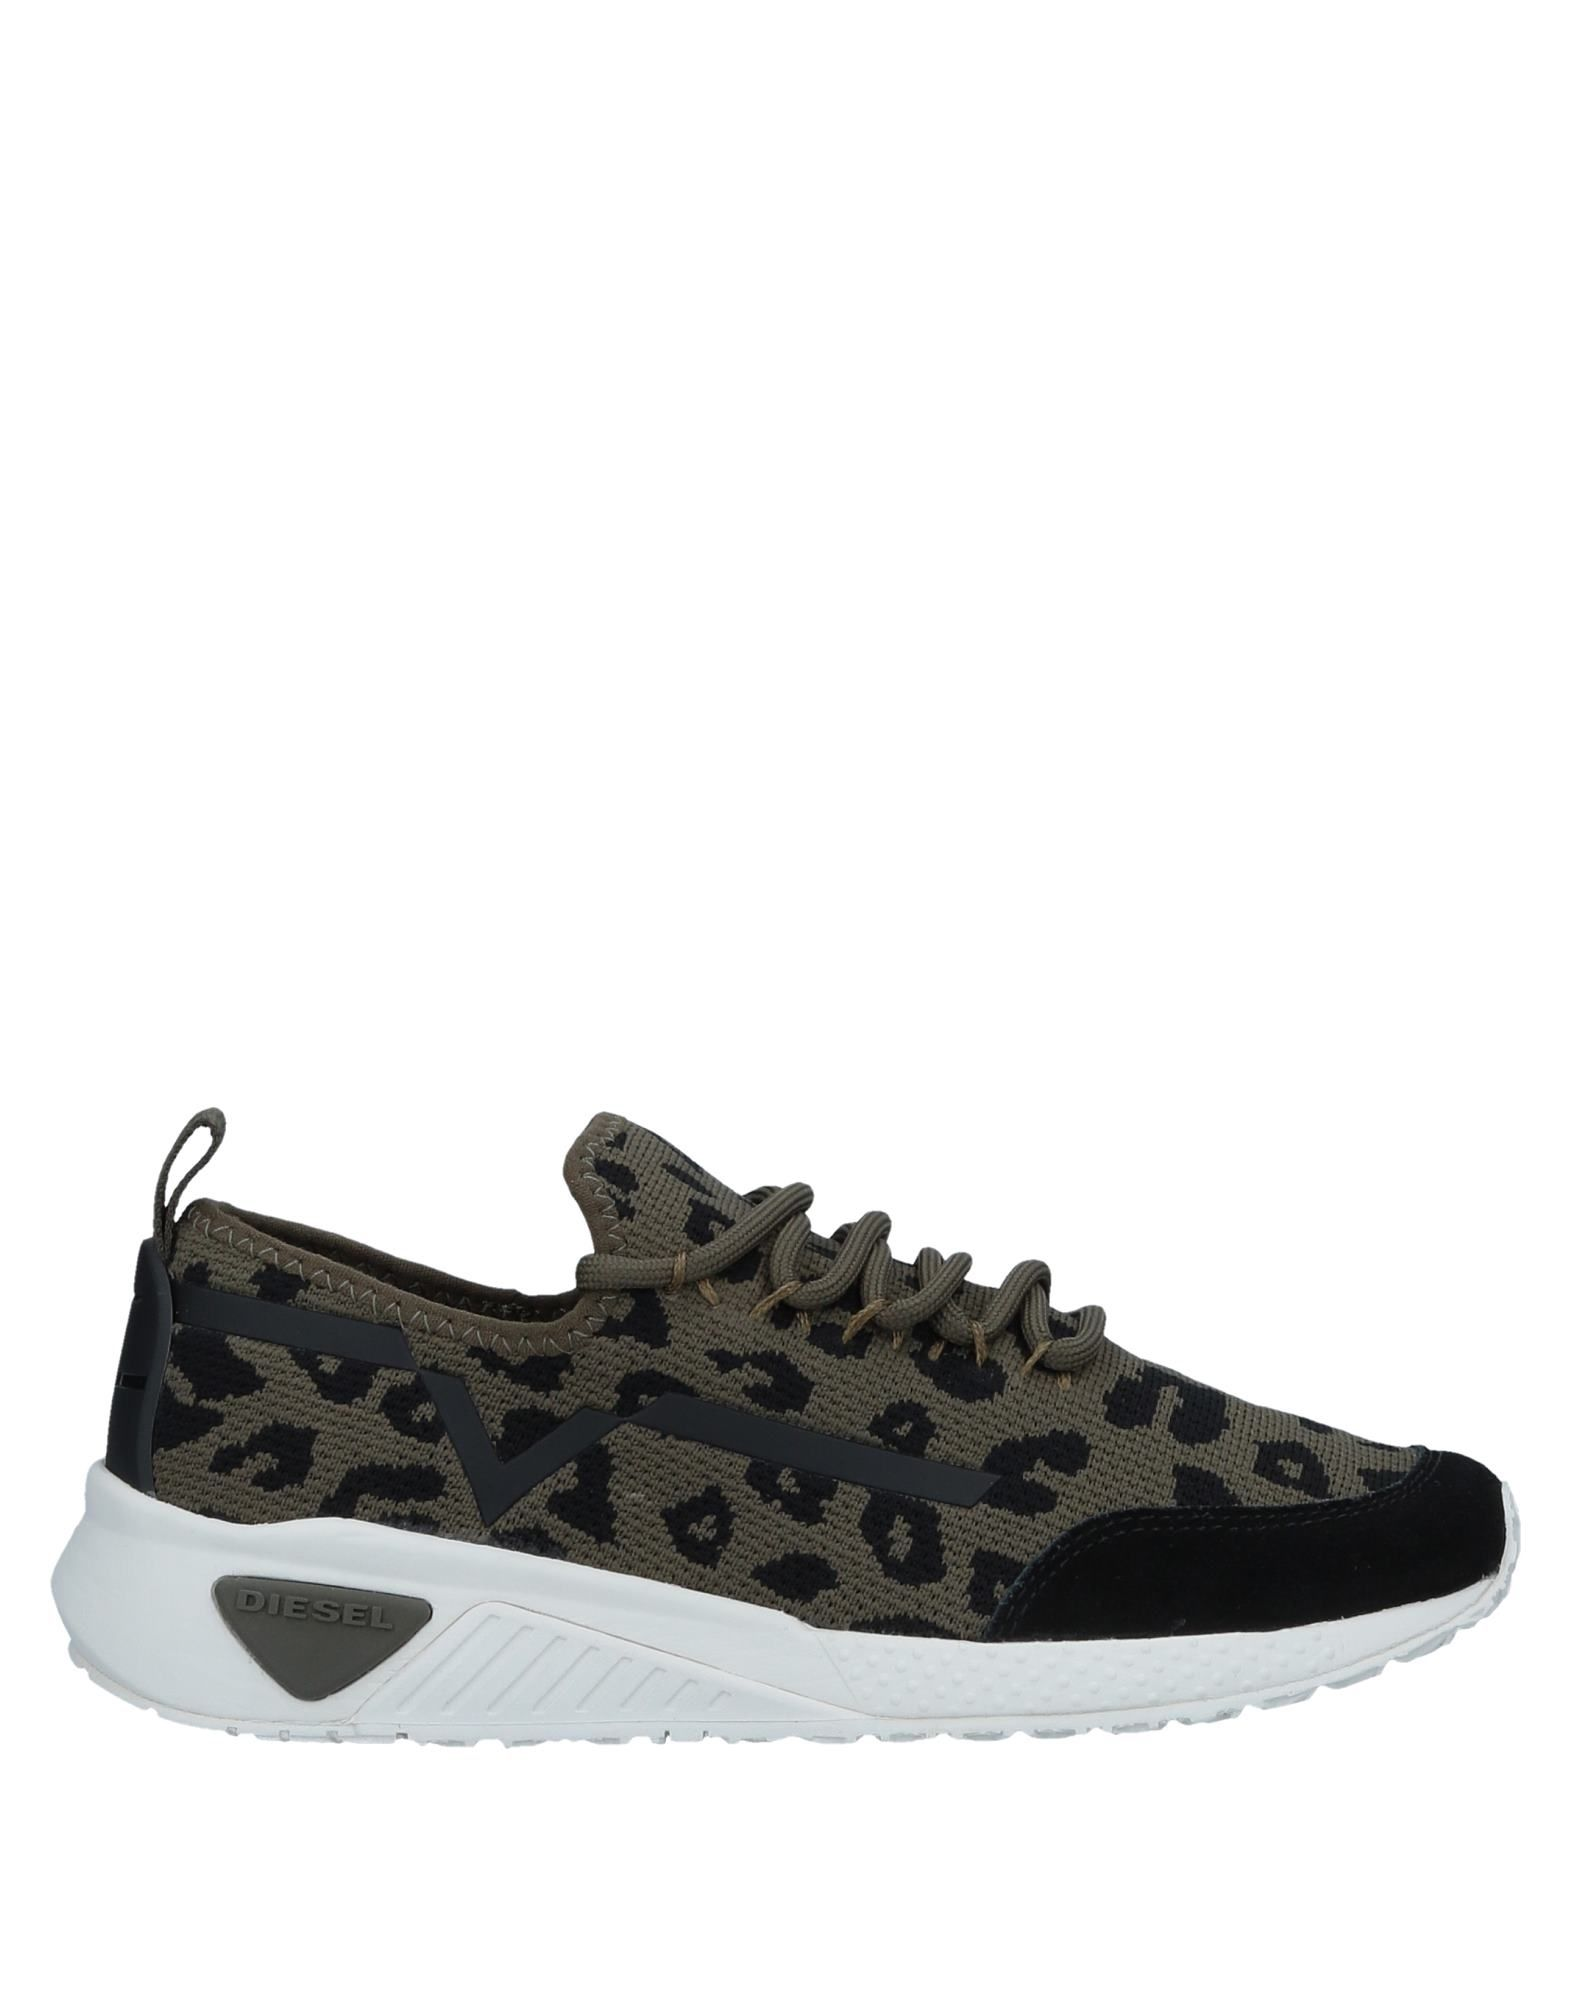 Moda Sneakers Diesel Donna - - Donna 11533778UT 3ec955